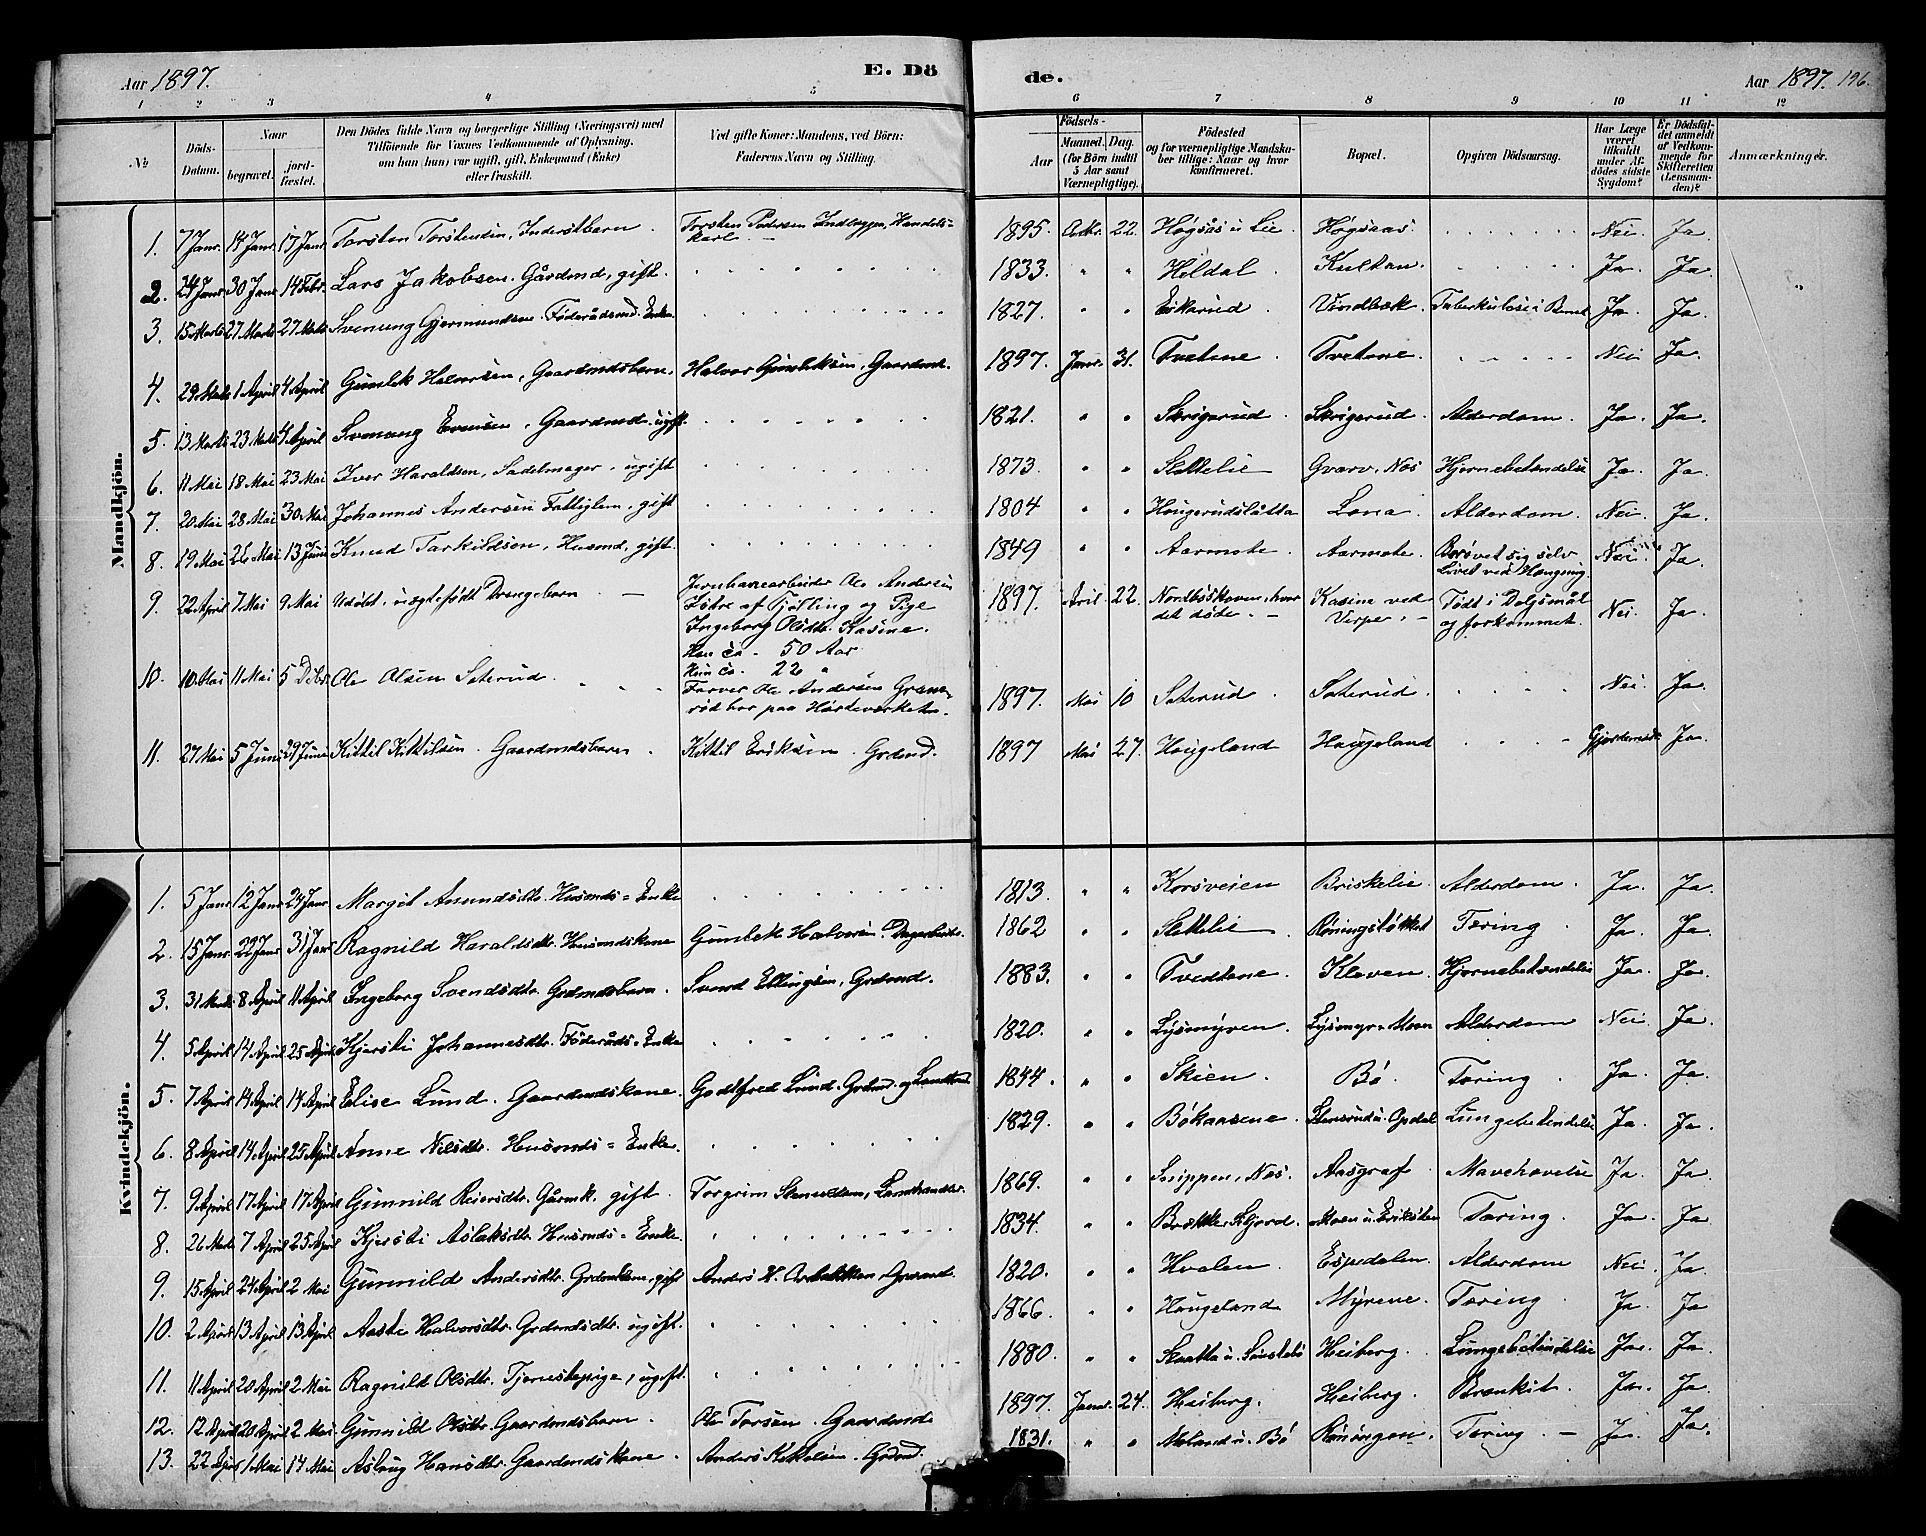 SAKO, Bø kirkebøker, G/Ga/L0005: Klokkerbok nr. 5, 1883-1897, s. 196